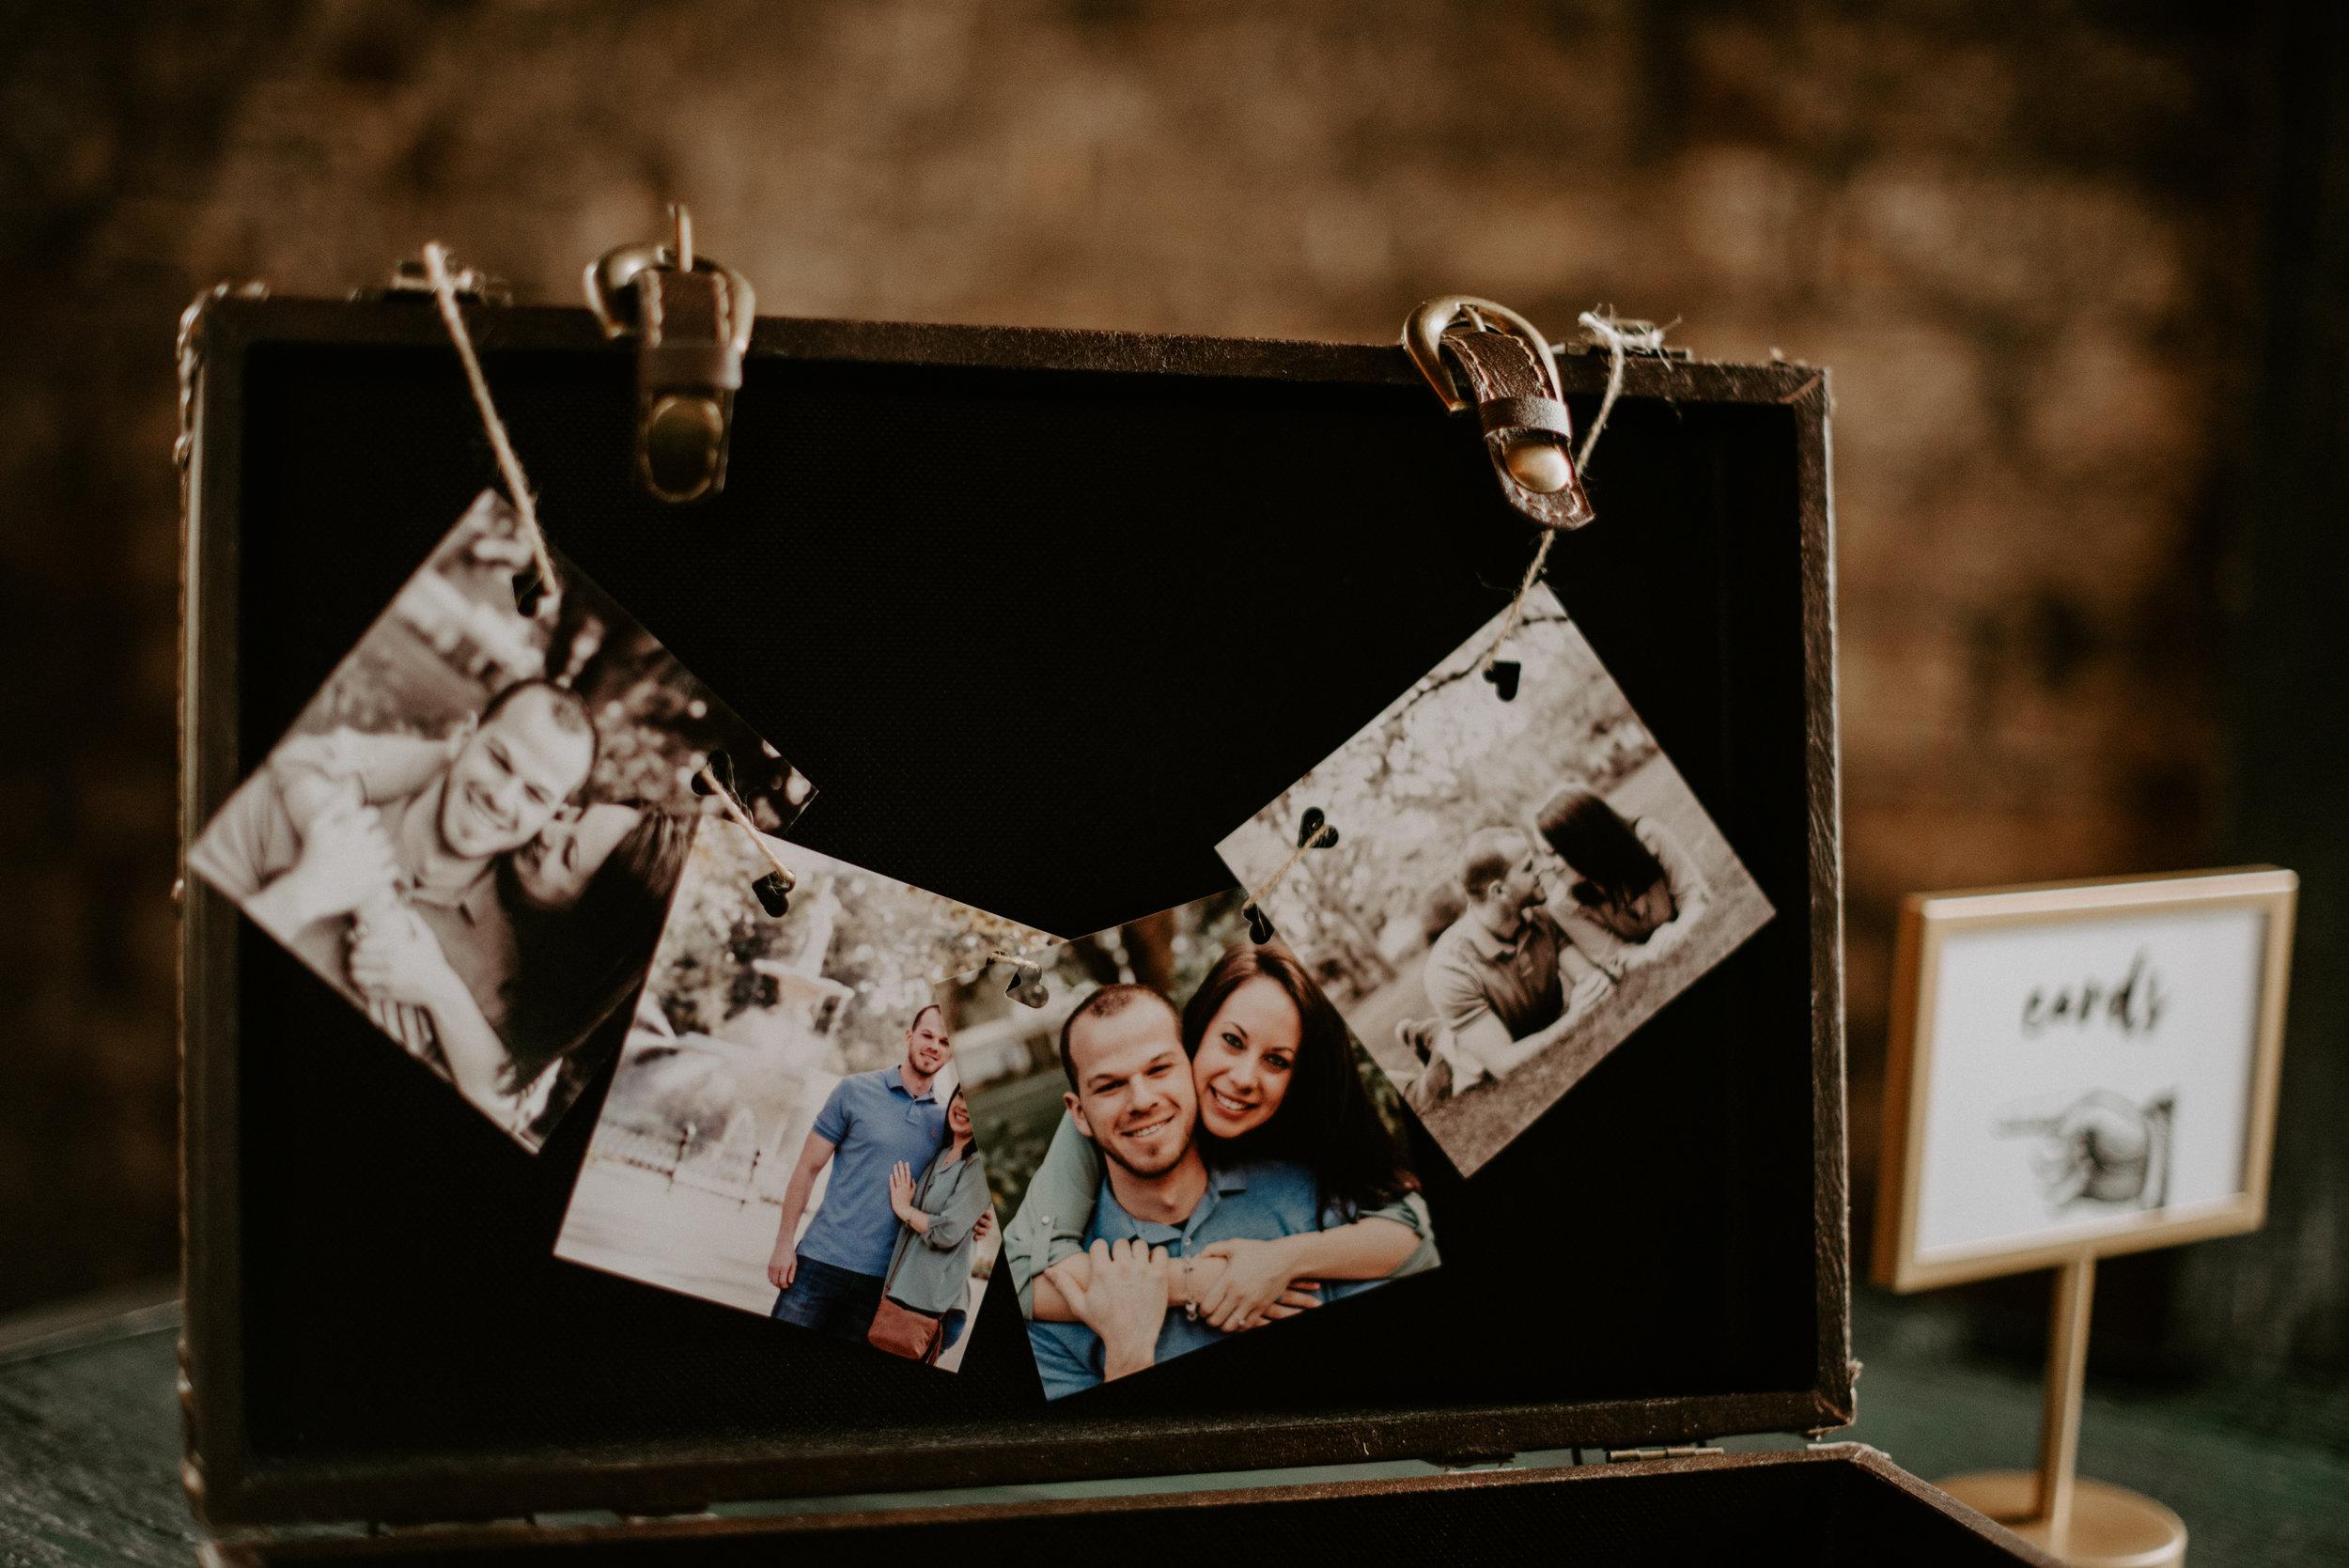 savannah-bridal-shop-andrea-and-mike-evergold-photography-georgia-state-railroad-museum-wedding-savannah-wedding-florist-savannah-wedding-planner-24.jpg